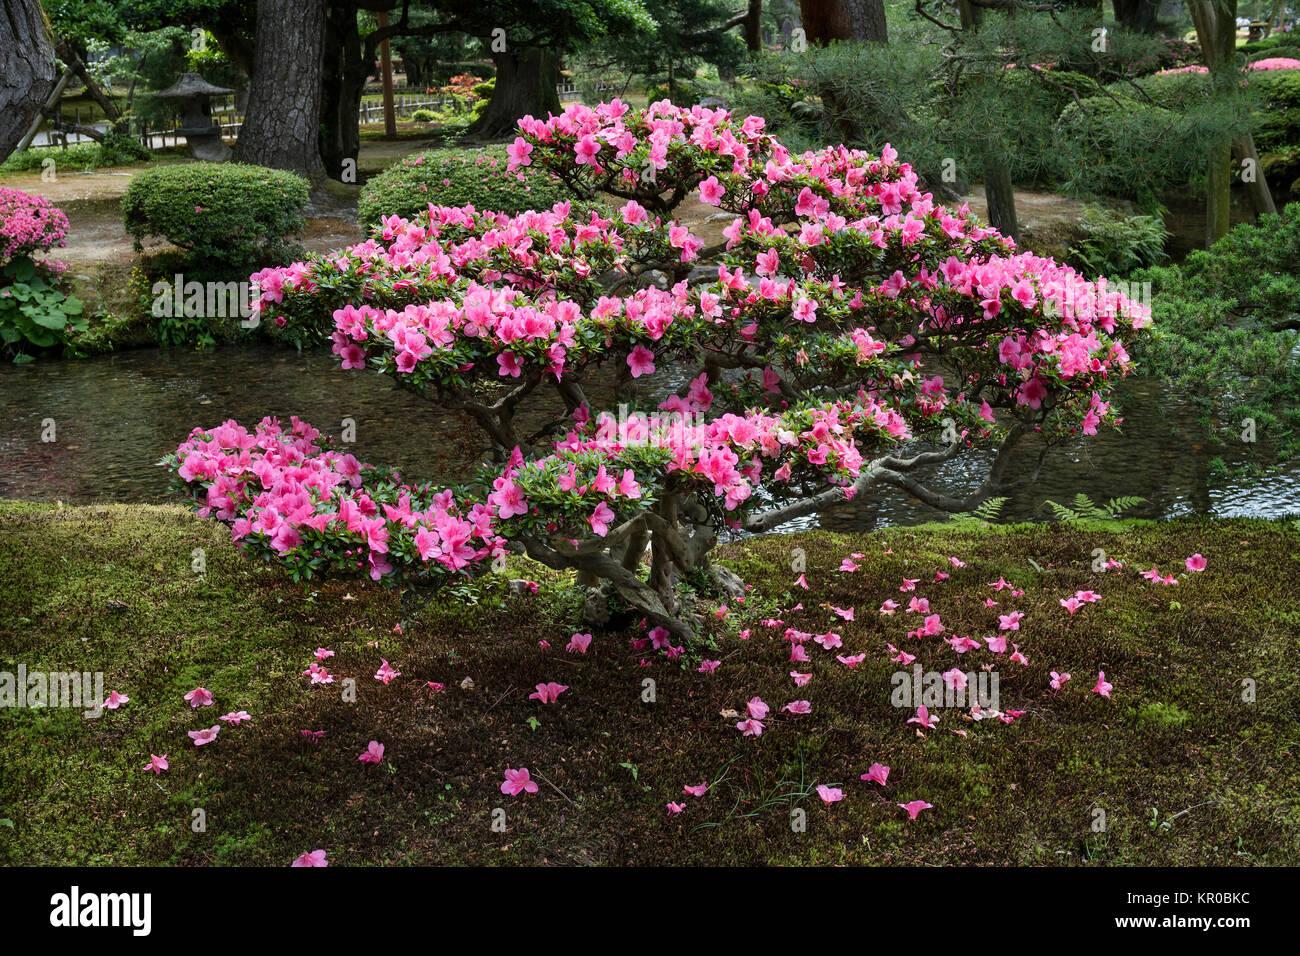 Kanazawa, Japan, 9. Juni 2017: rosa blühende Azalee Strauch in Kanasawa Gyokuseninmaru Garten am Schloss im Frühling Stockfoto